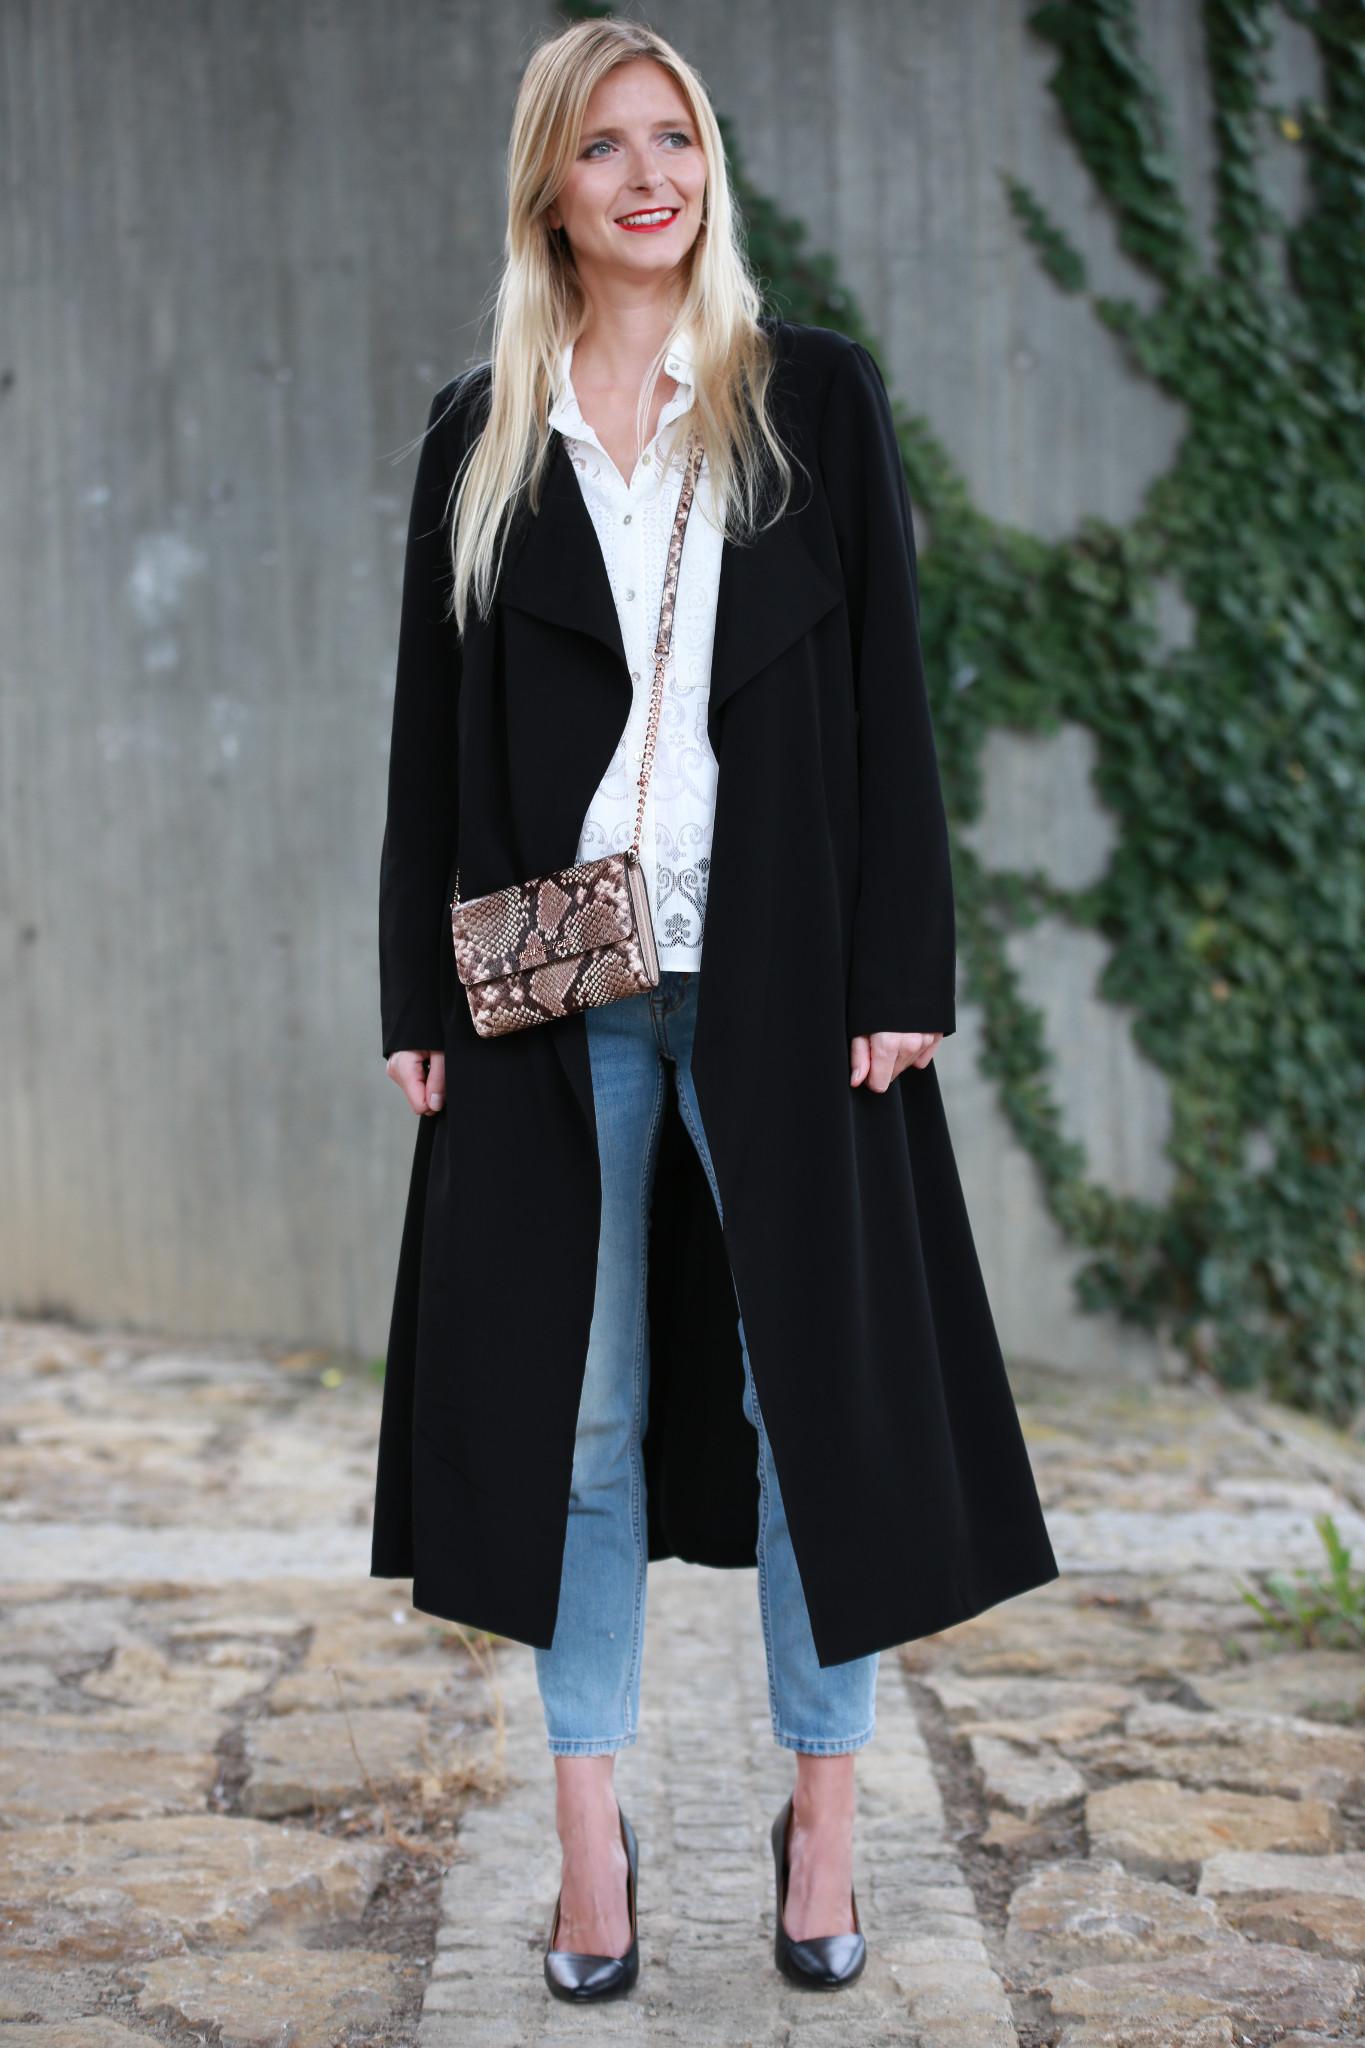 Fashion_Outfit_Michael_Kors_Jet_Set_20